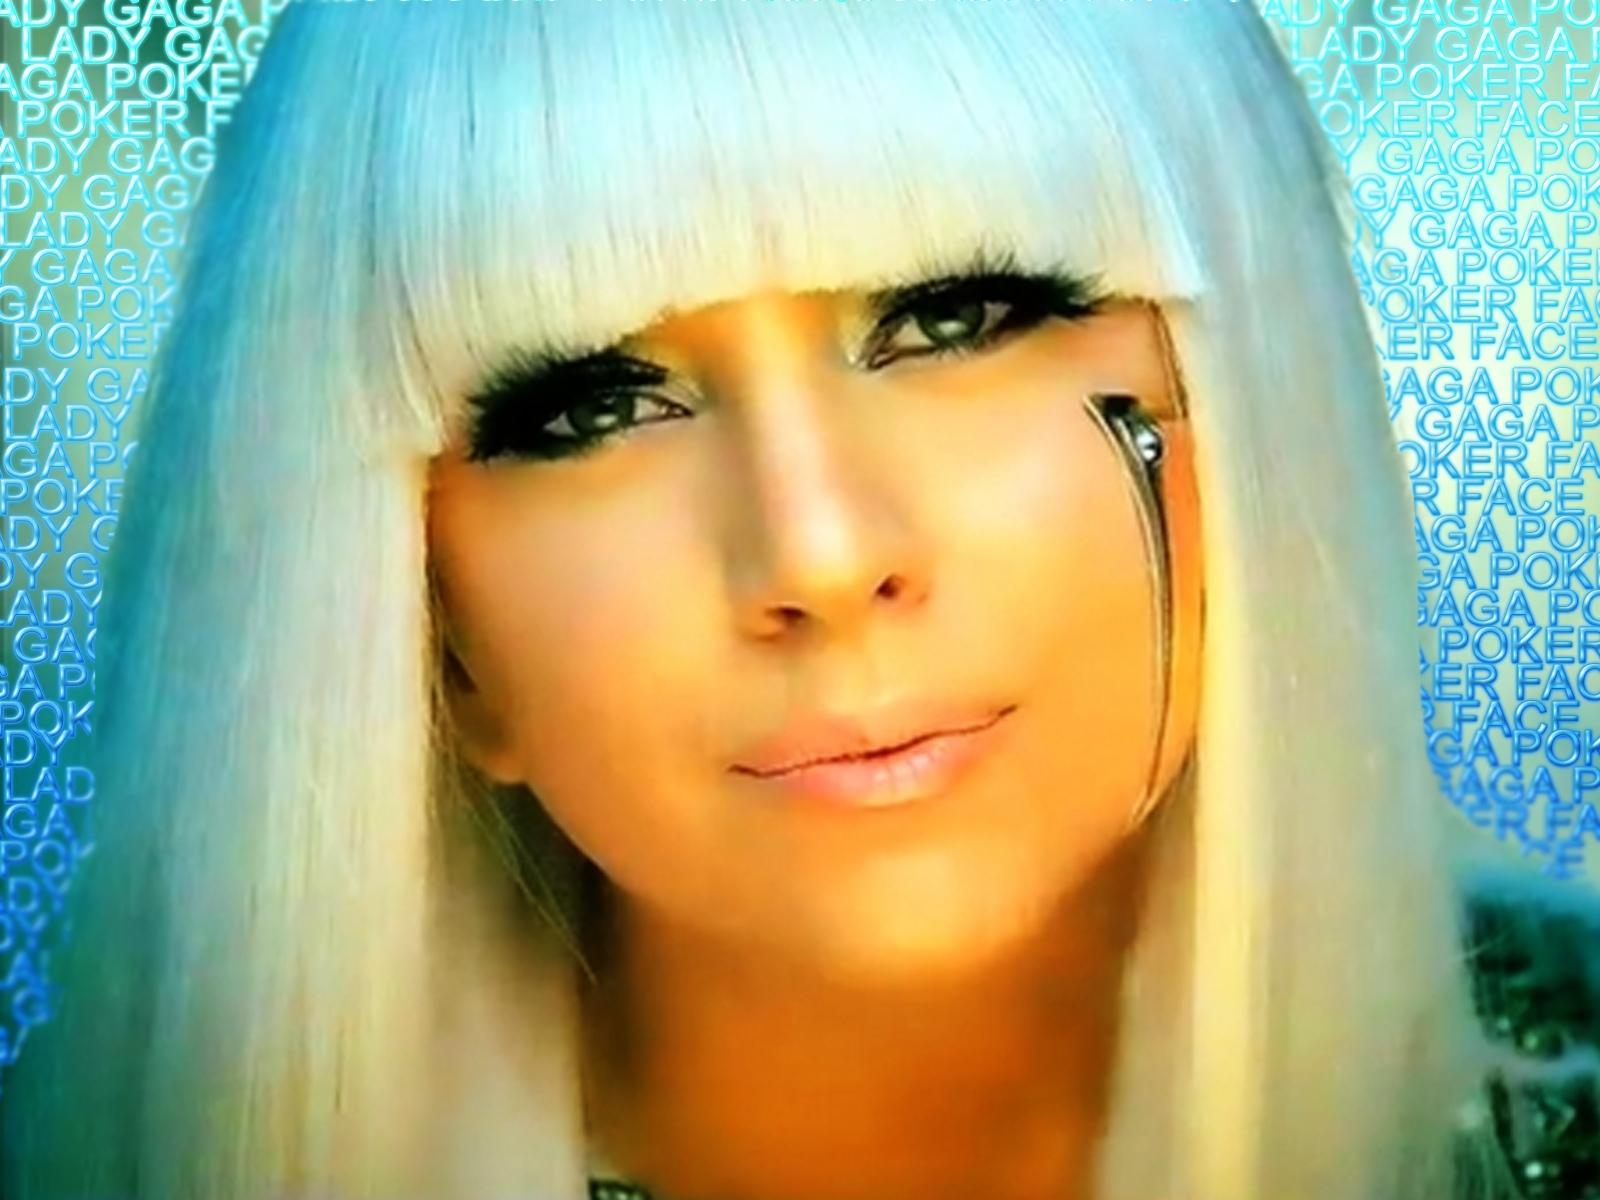 http://1.bp.blogspot.com/_8UKgUnM8jTc/TLI5zwMF9AI/AAAAAAAAAJc/sdS5hp1Hvv8/s1600/lady-gaga-1.jpg